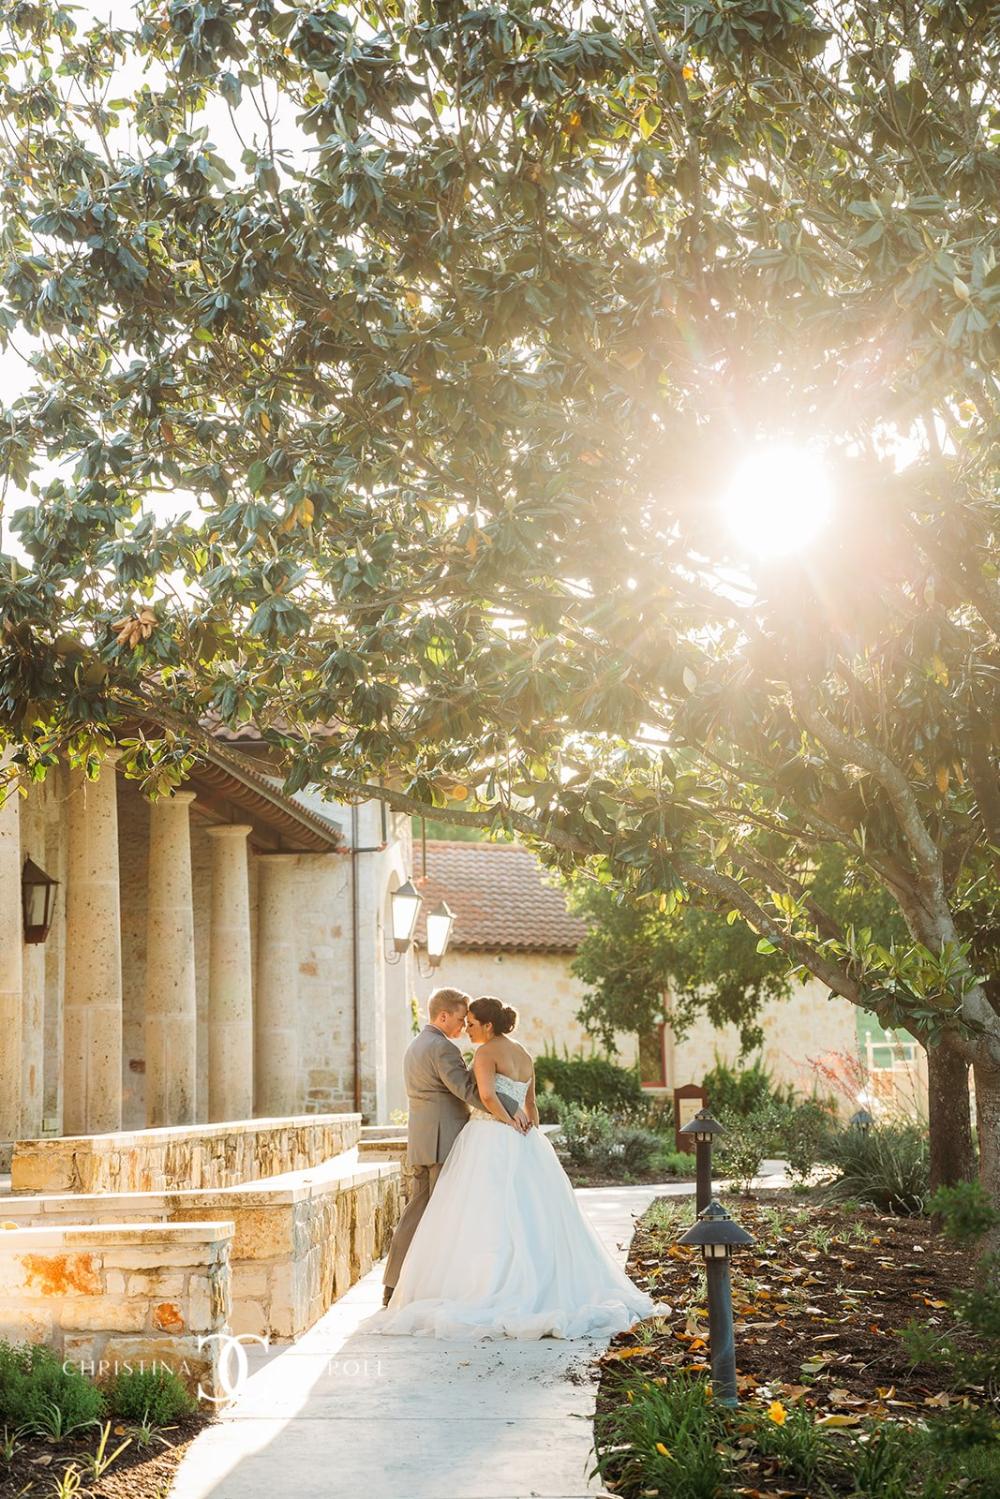 Sunset Peeking Through The Magnolia Trees At The Front Of Garey House Georgetown Tx Wedding Venue Austin Wedd In 2020 Austin Wedding Venues Austin Wedding Wedding